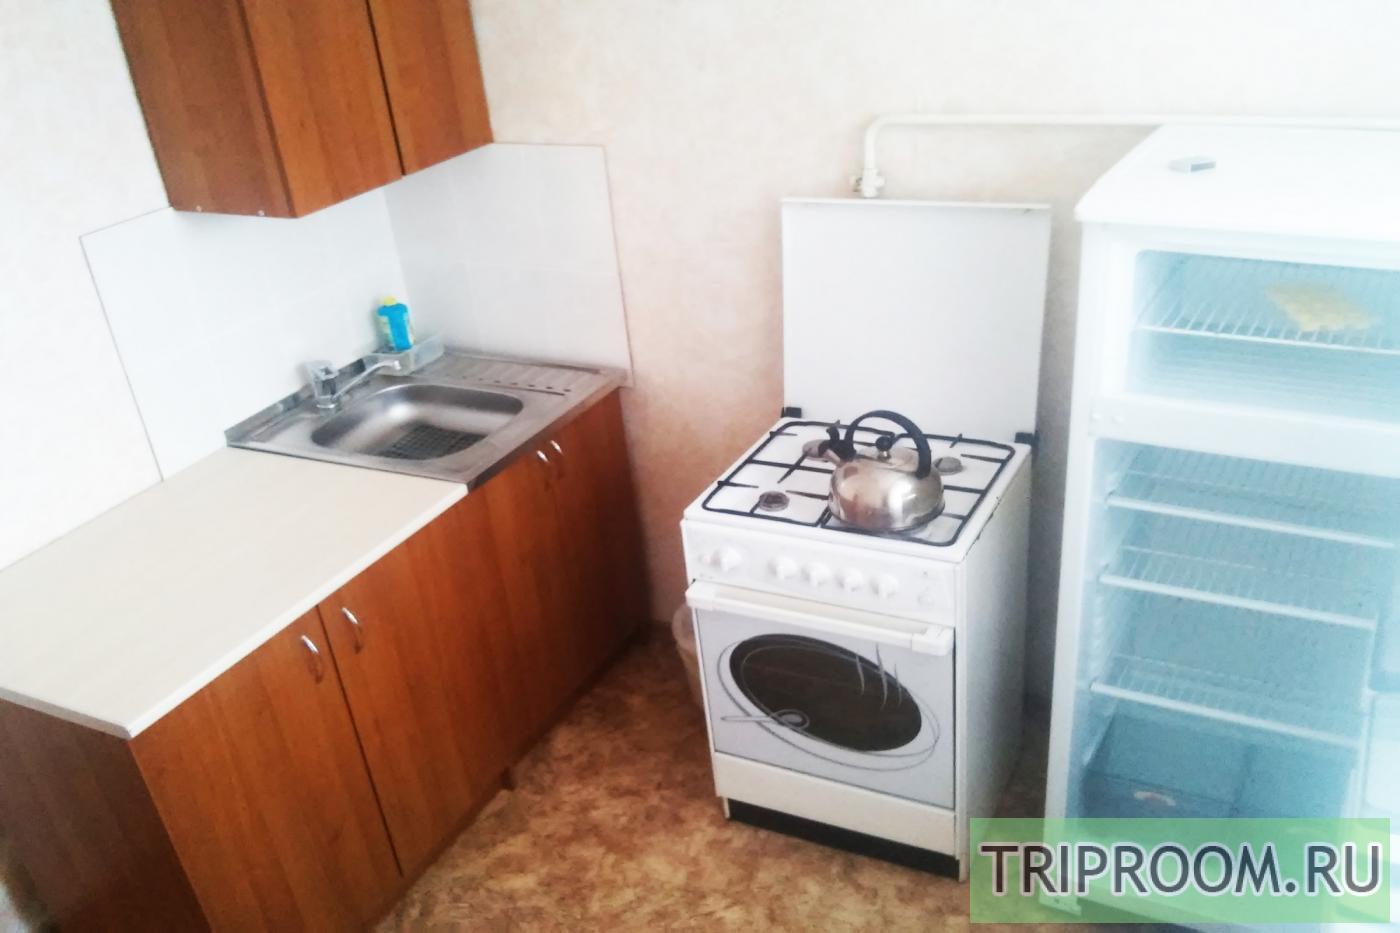 1-комнатная квартира посуточно (вариант № 34542), ул. Маршала Рыбалко, фото № 11